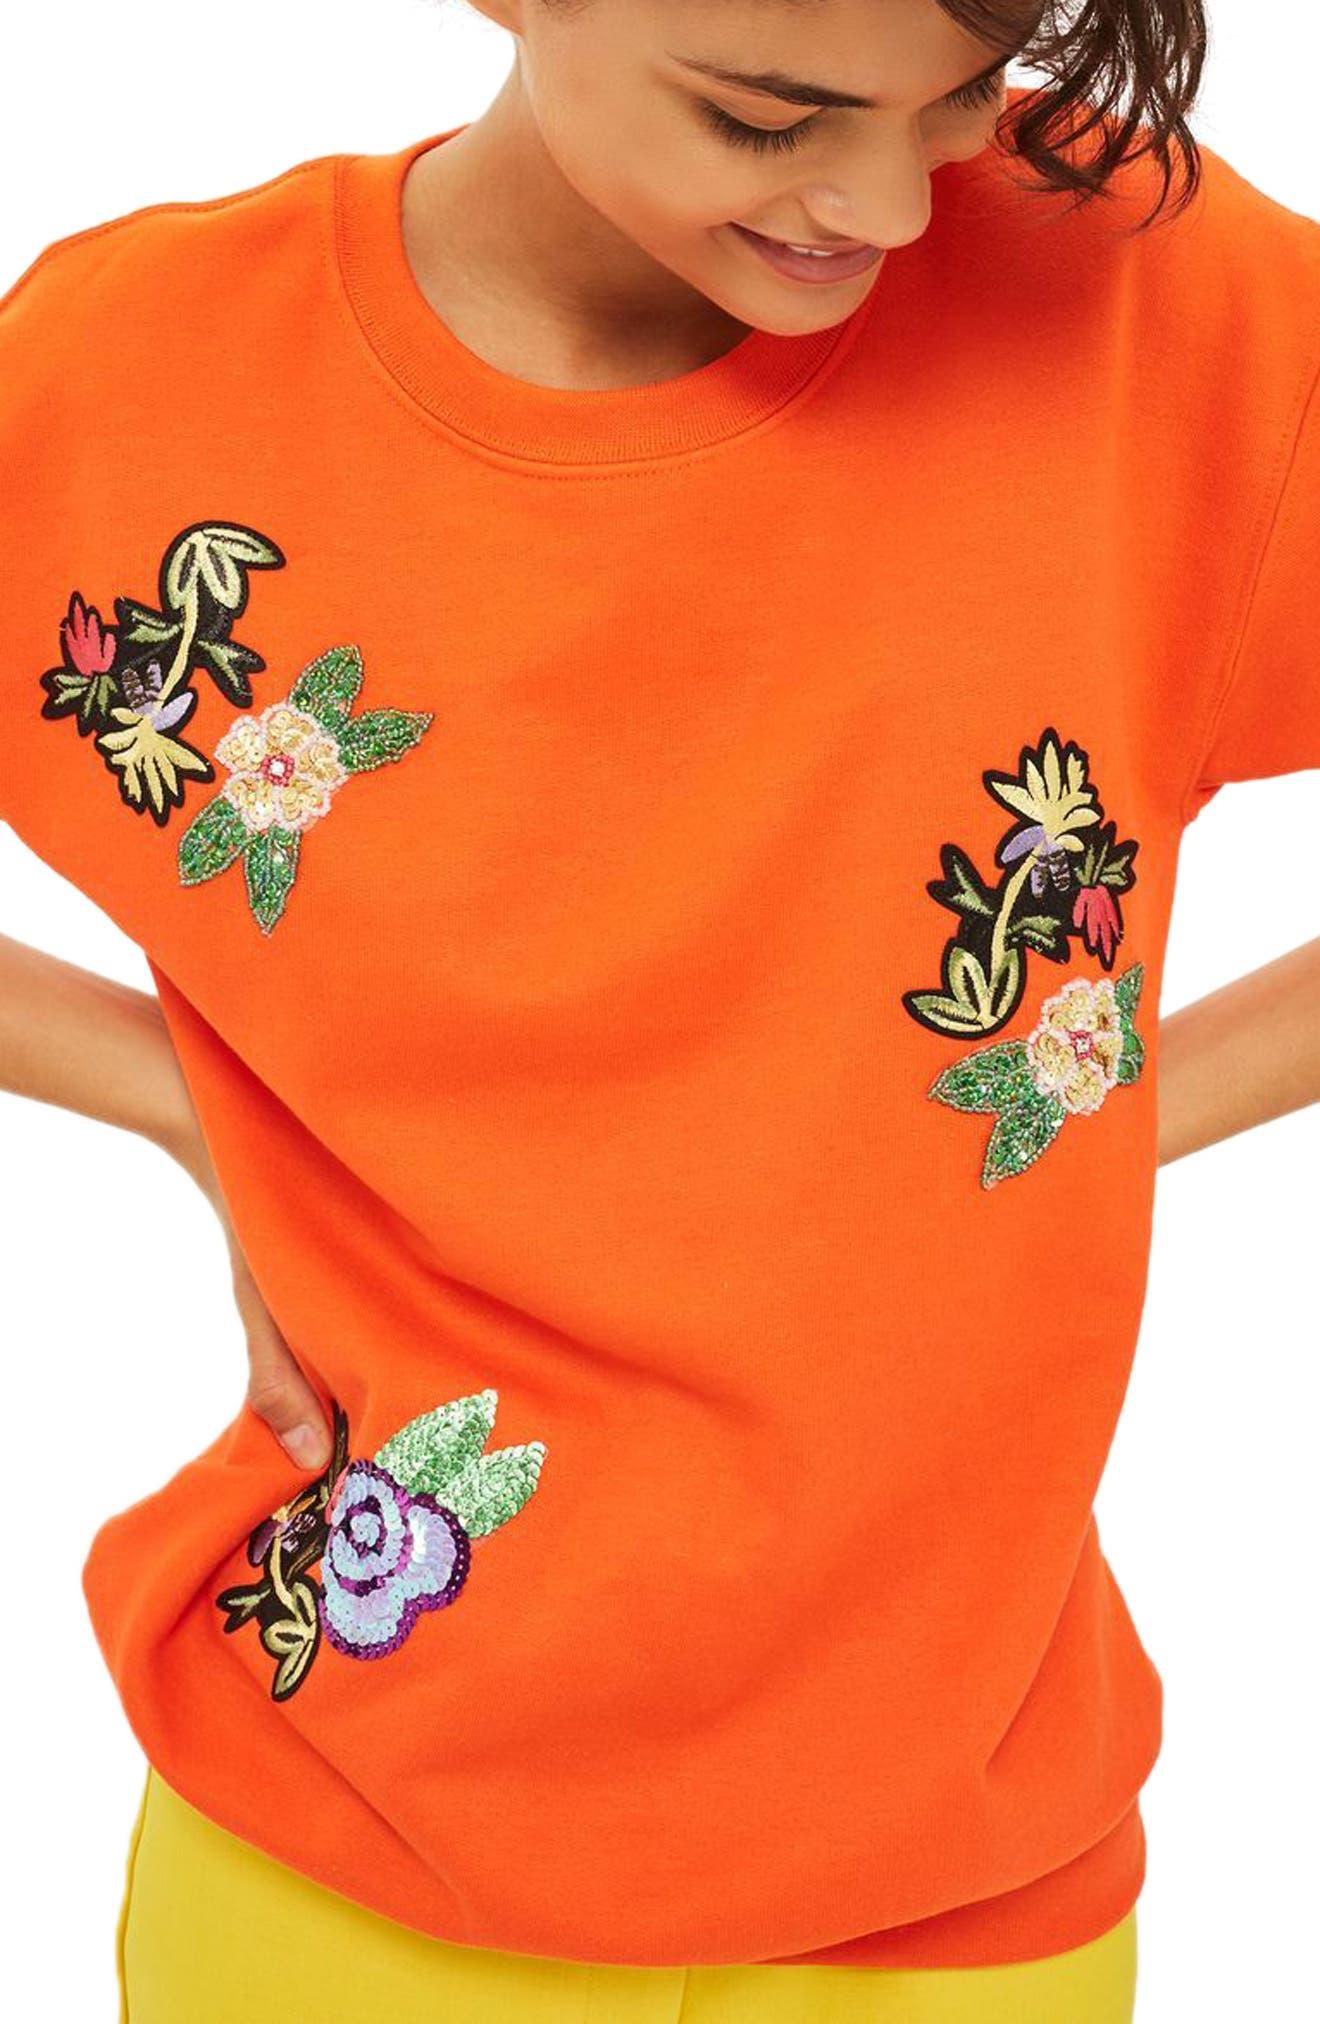 Main Image - Topshop Floral Appliqué Embroidered Sweatshirt